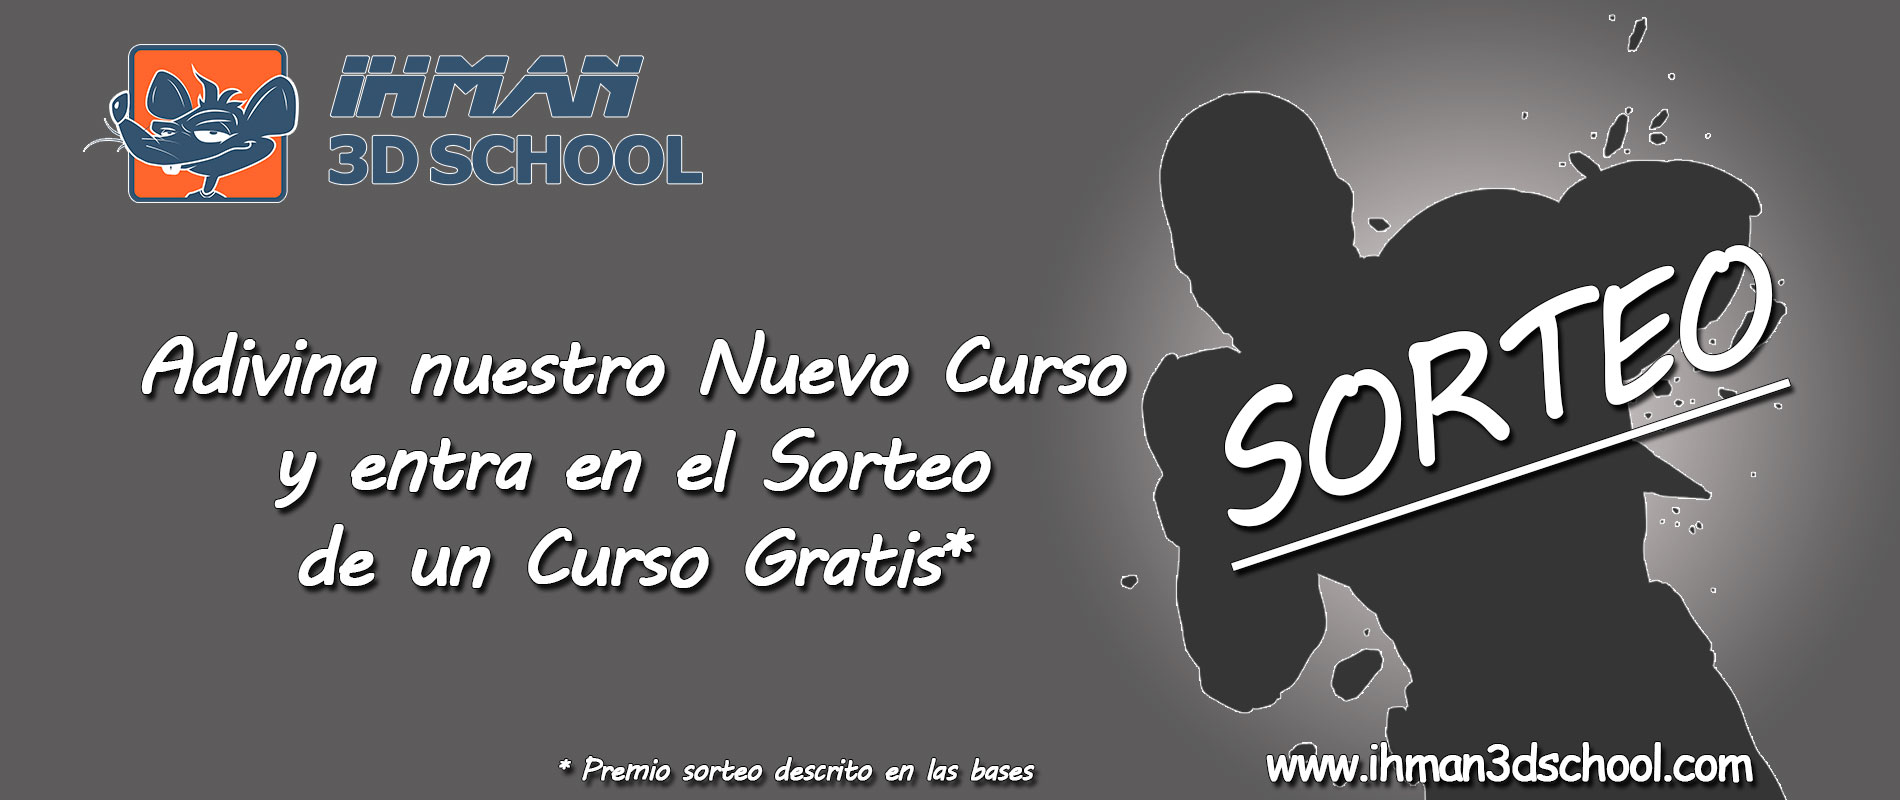 Presentación Ihman 3D School-facebook_sorteo.jpg